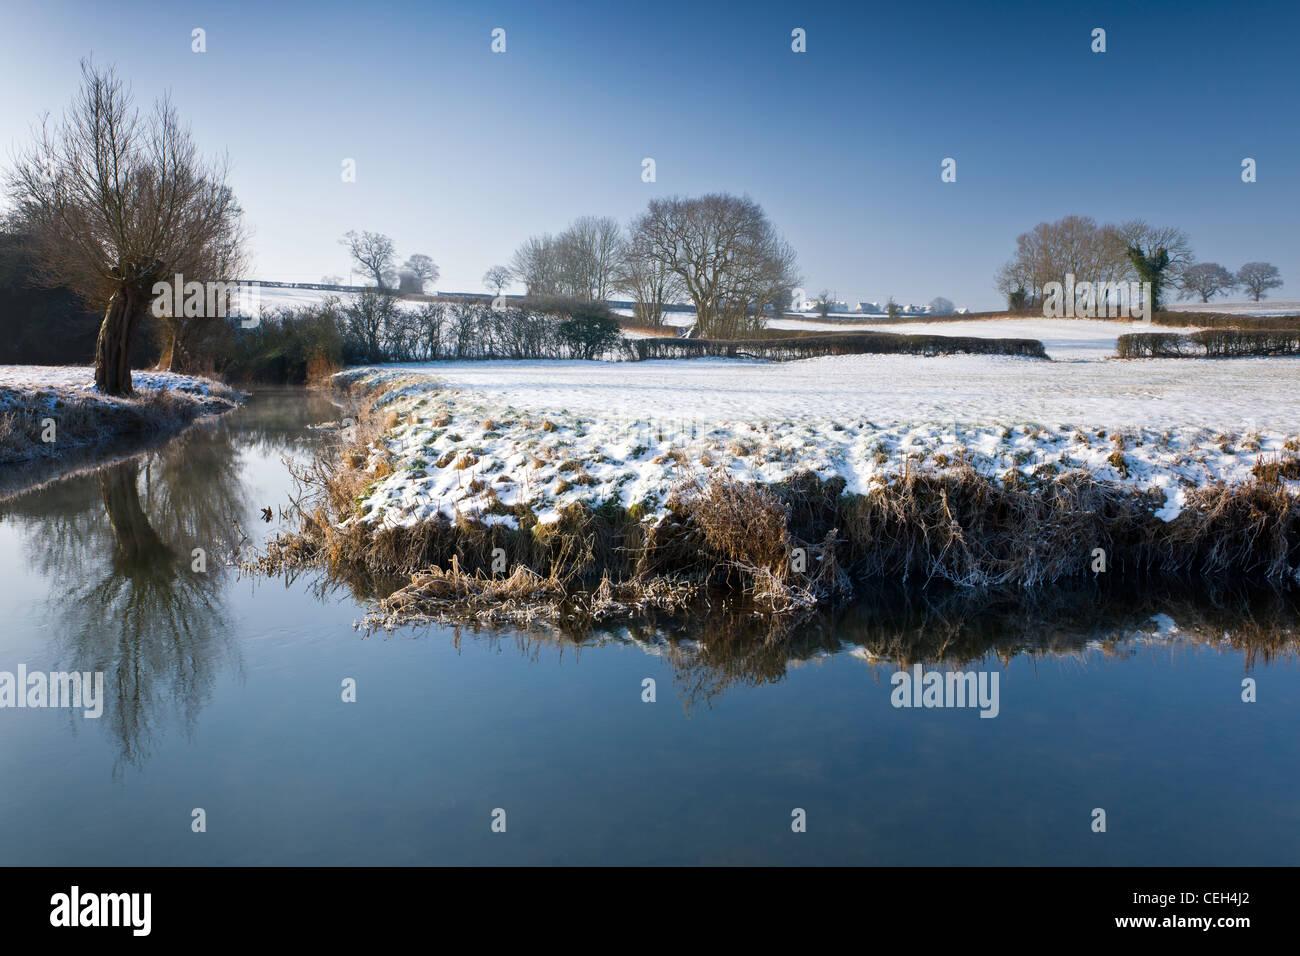 River Avon in Winter - Wiltshire Stock Photo